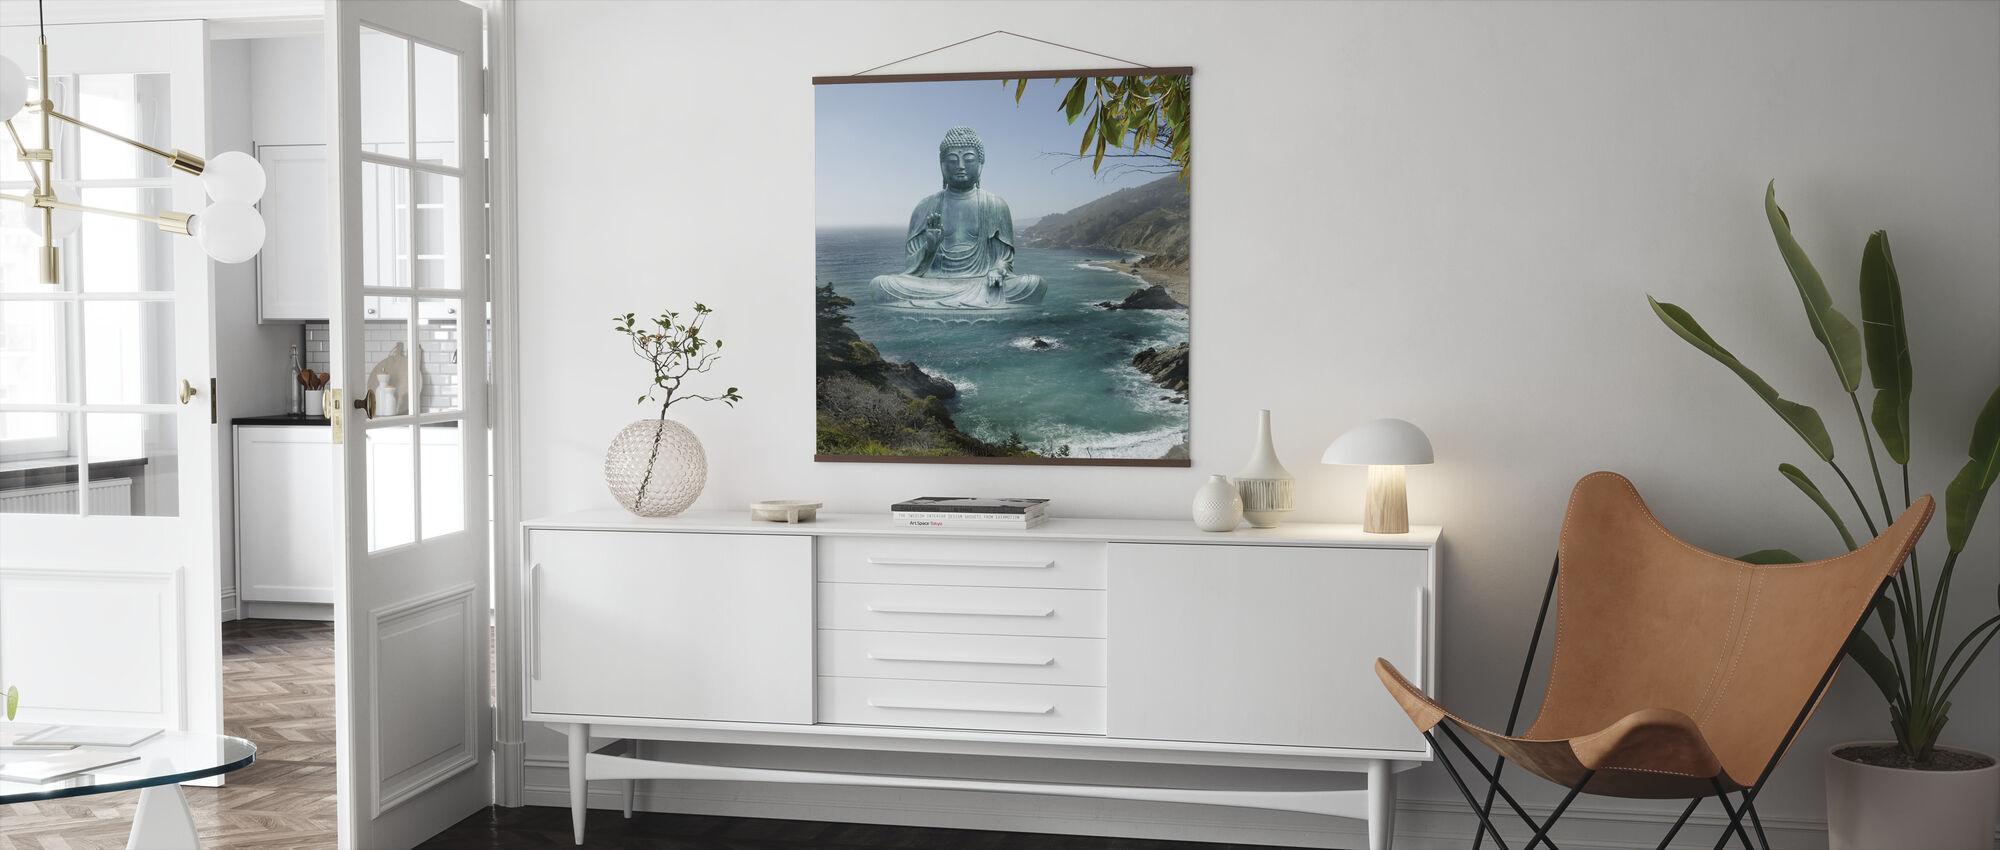 Big Sur te hage Buddha - Plakat - Stue